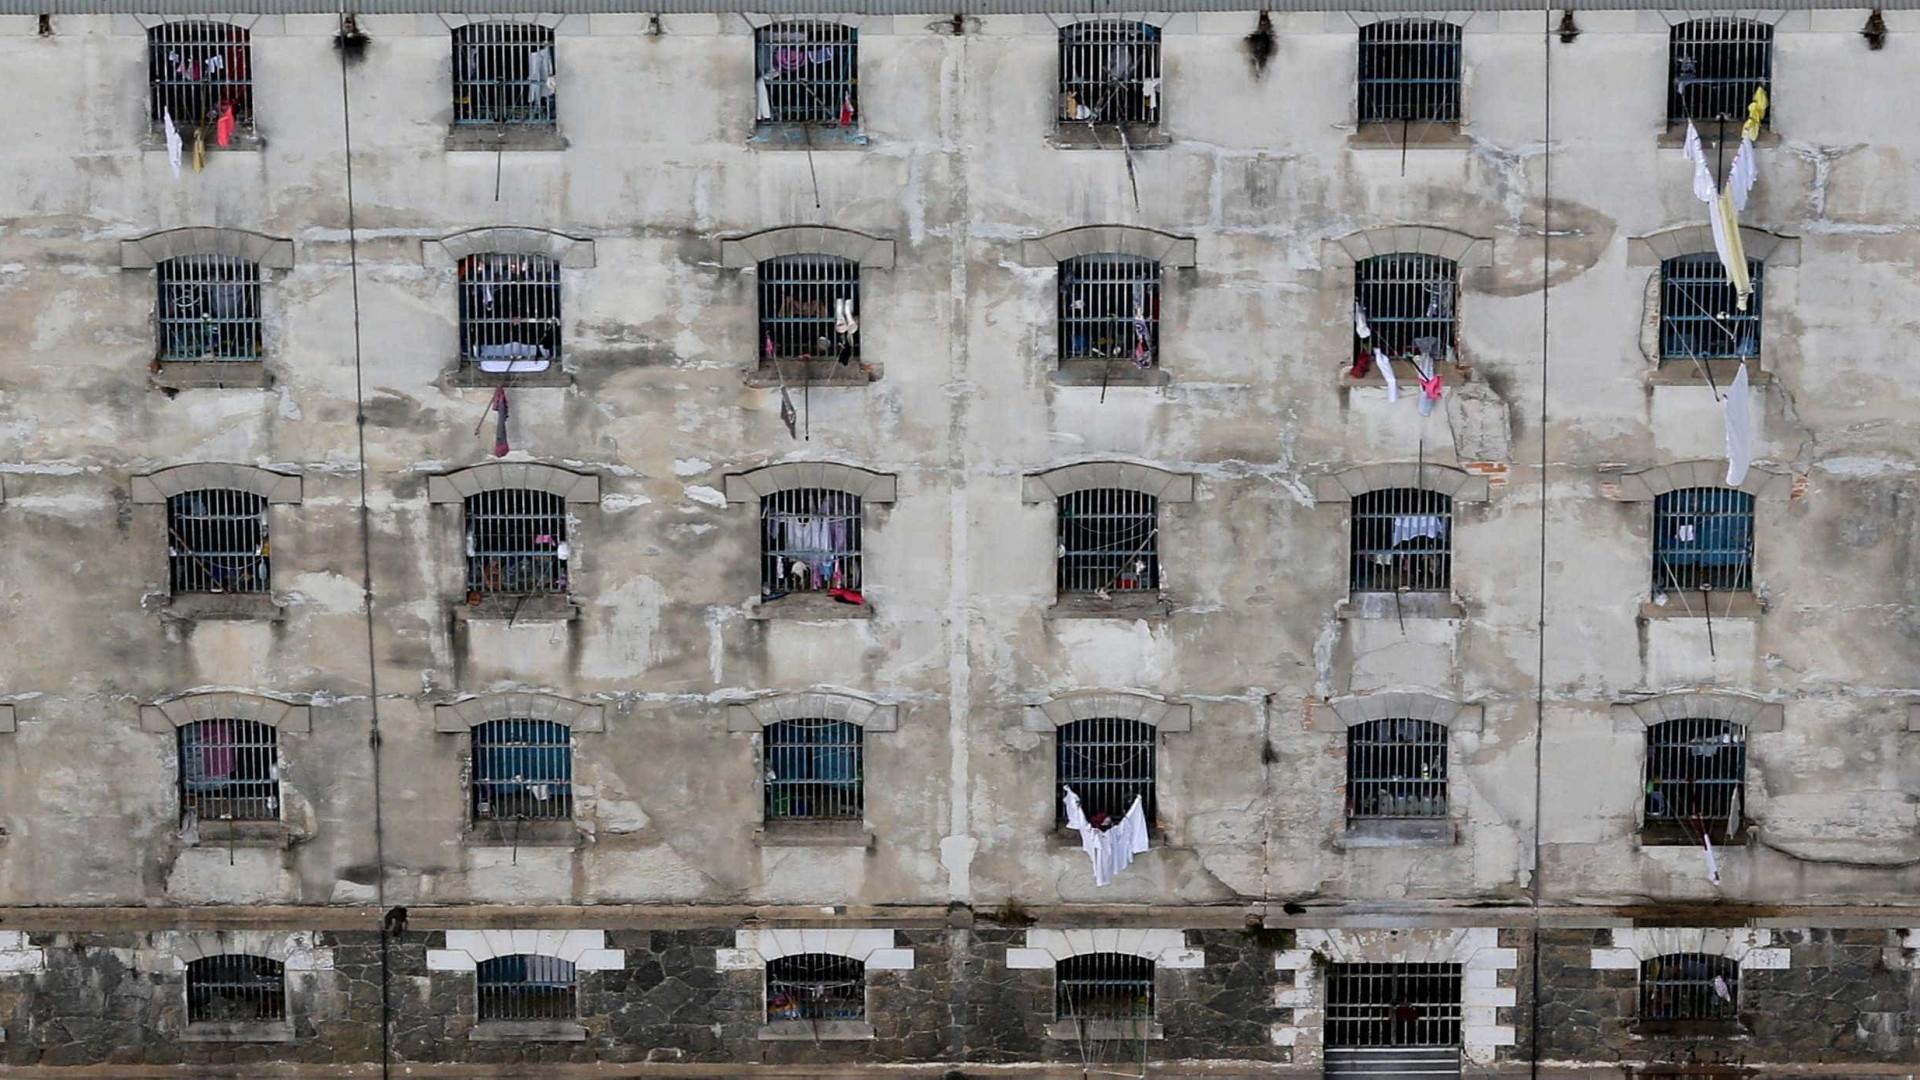 PCC planejou curso de bomba e 'bondes de guerra', diz Promotoria